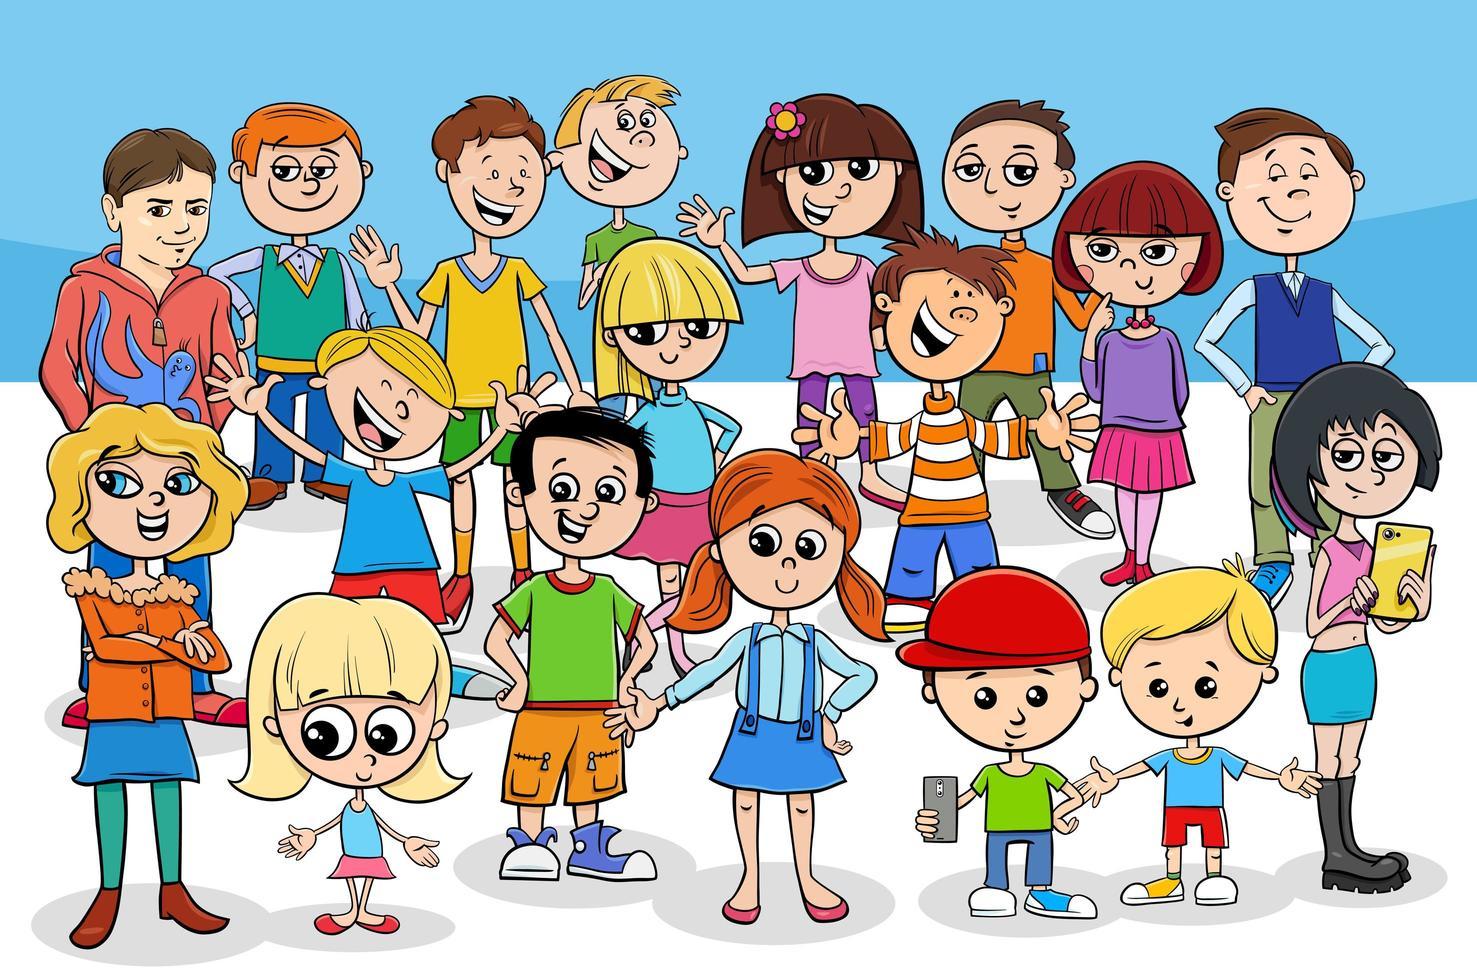 kids and teens cartoon characters group vector